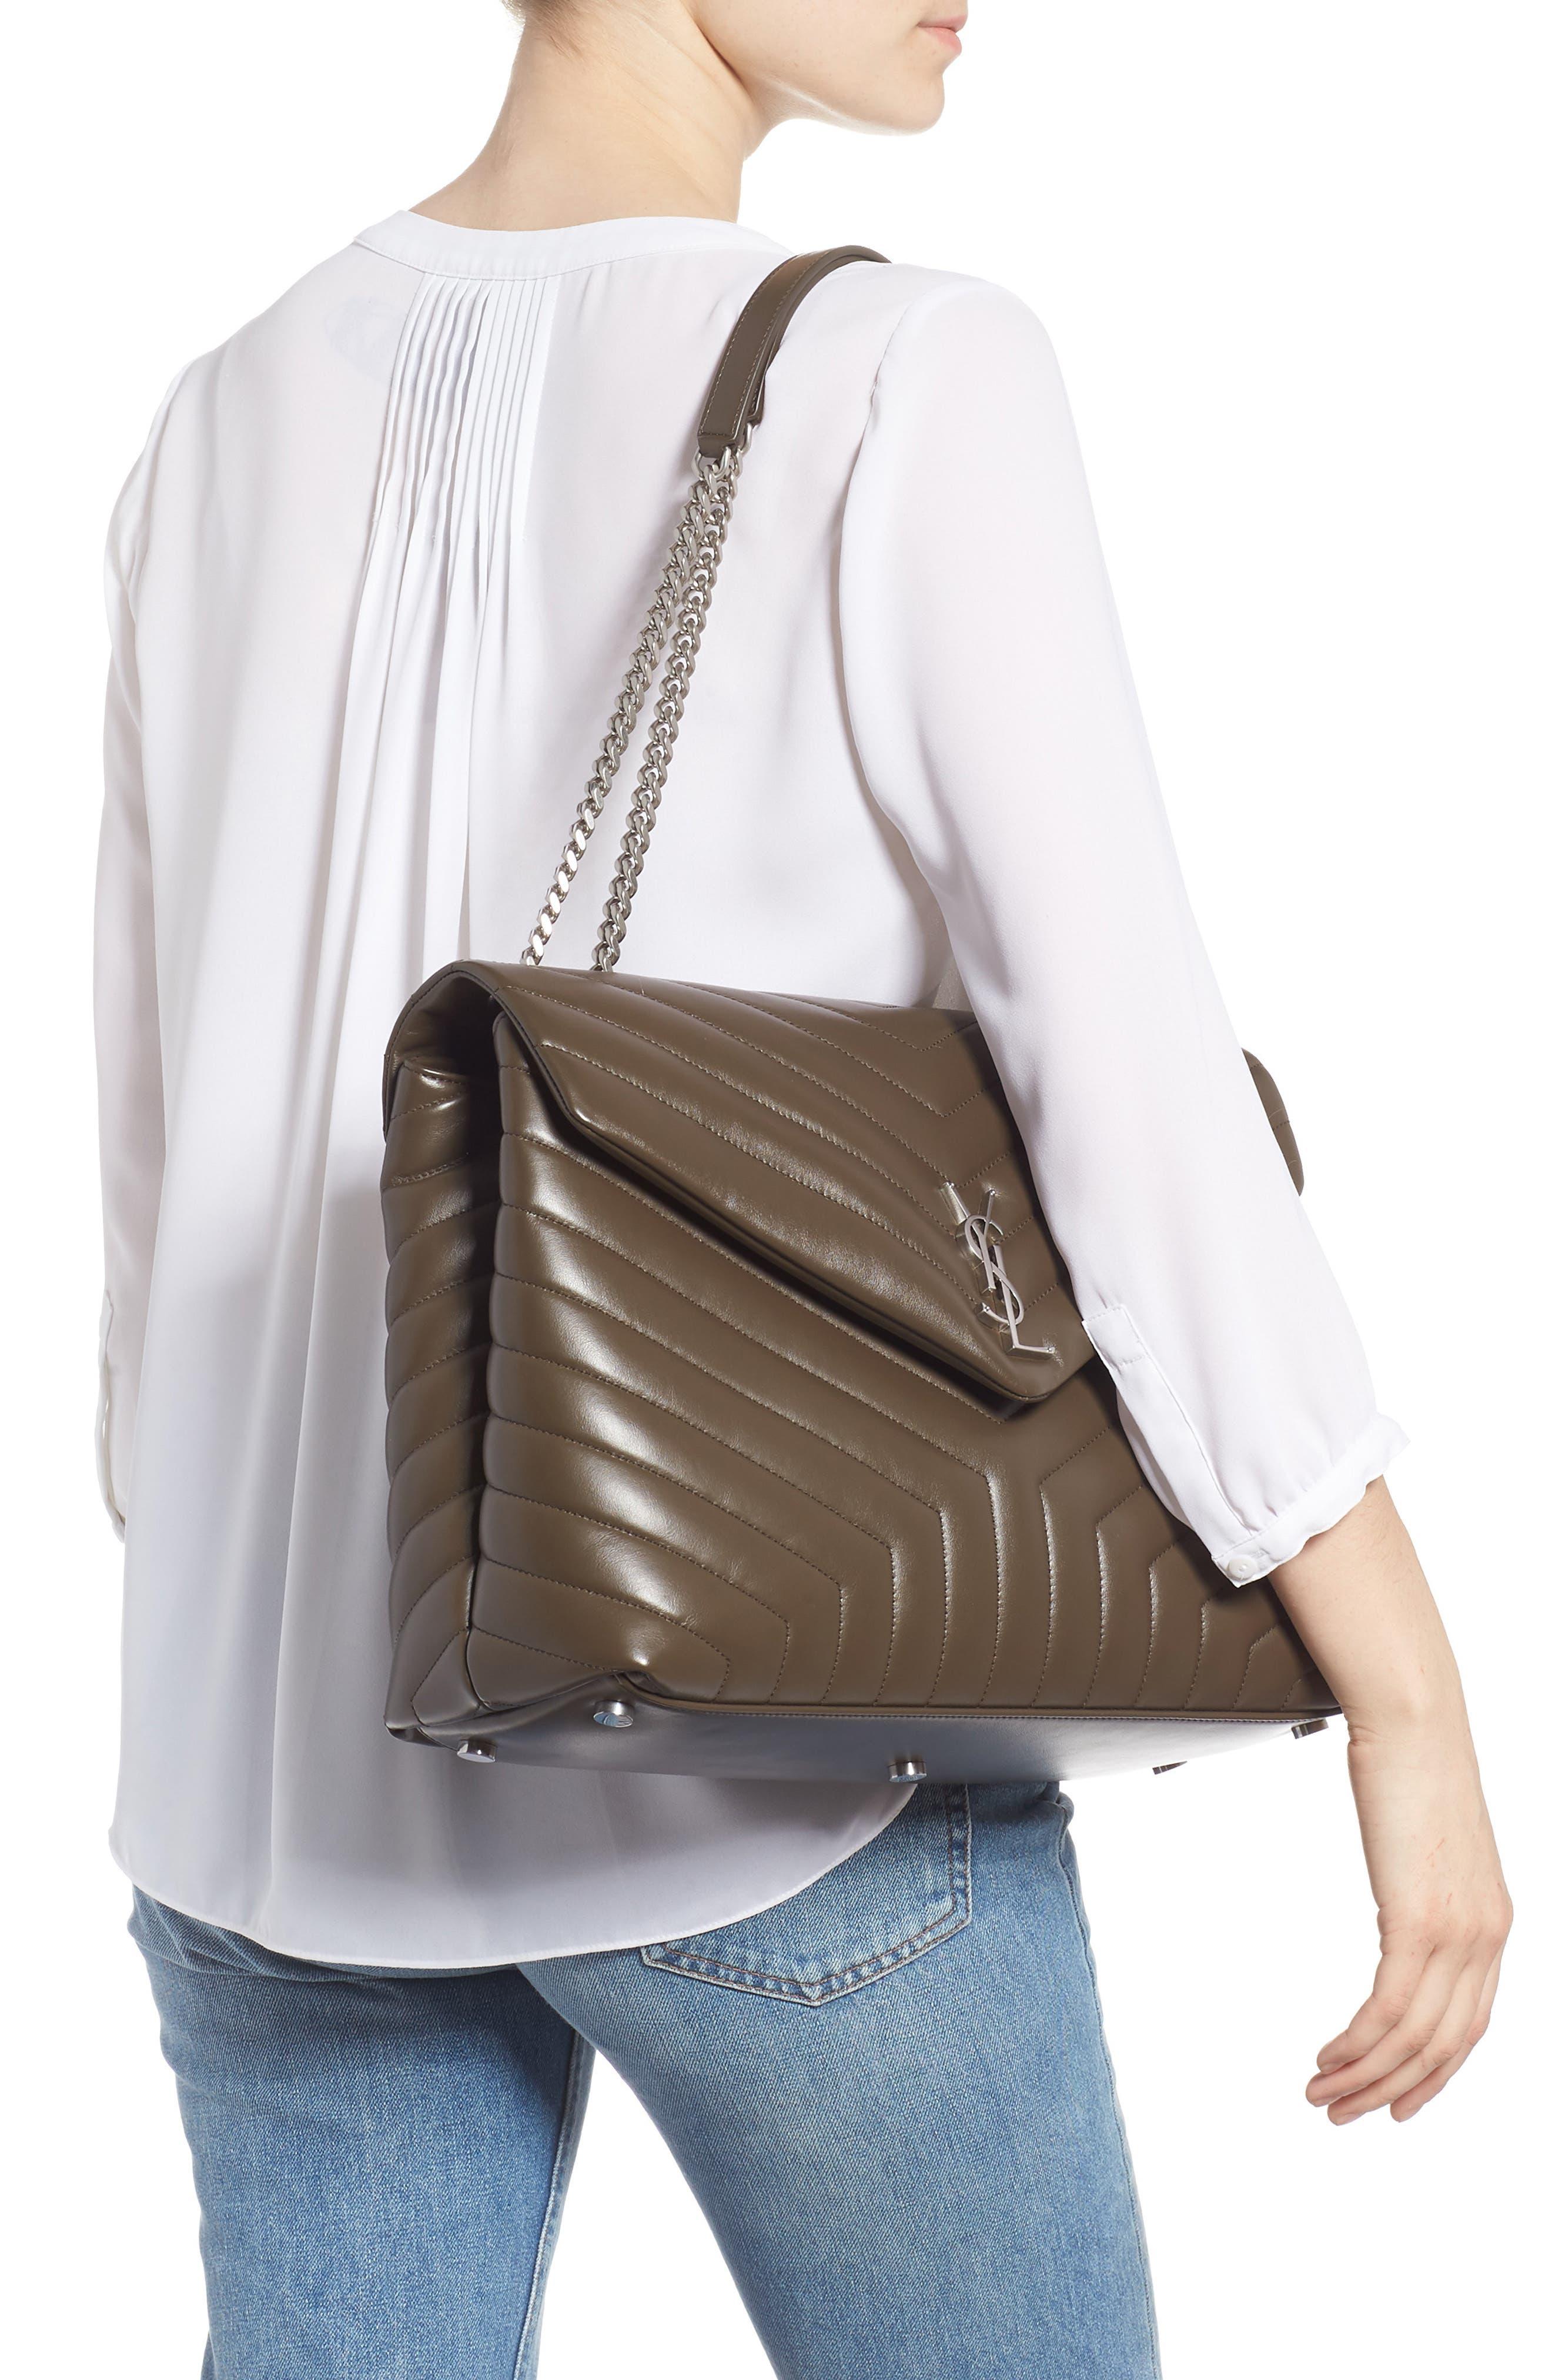 Large Loulou Matelassé Leather Shoulder Bag,                             Alternate thumbnail 2, color,                             FAGGIO/ FAGGIO